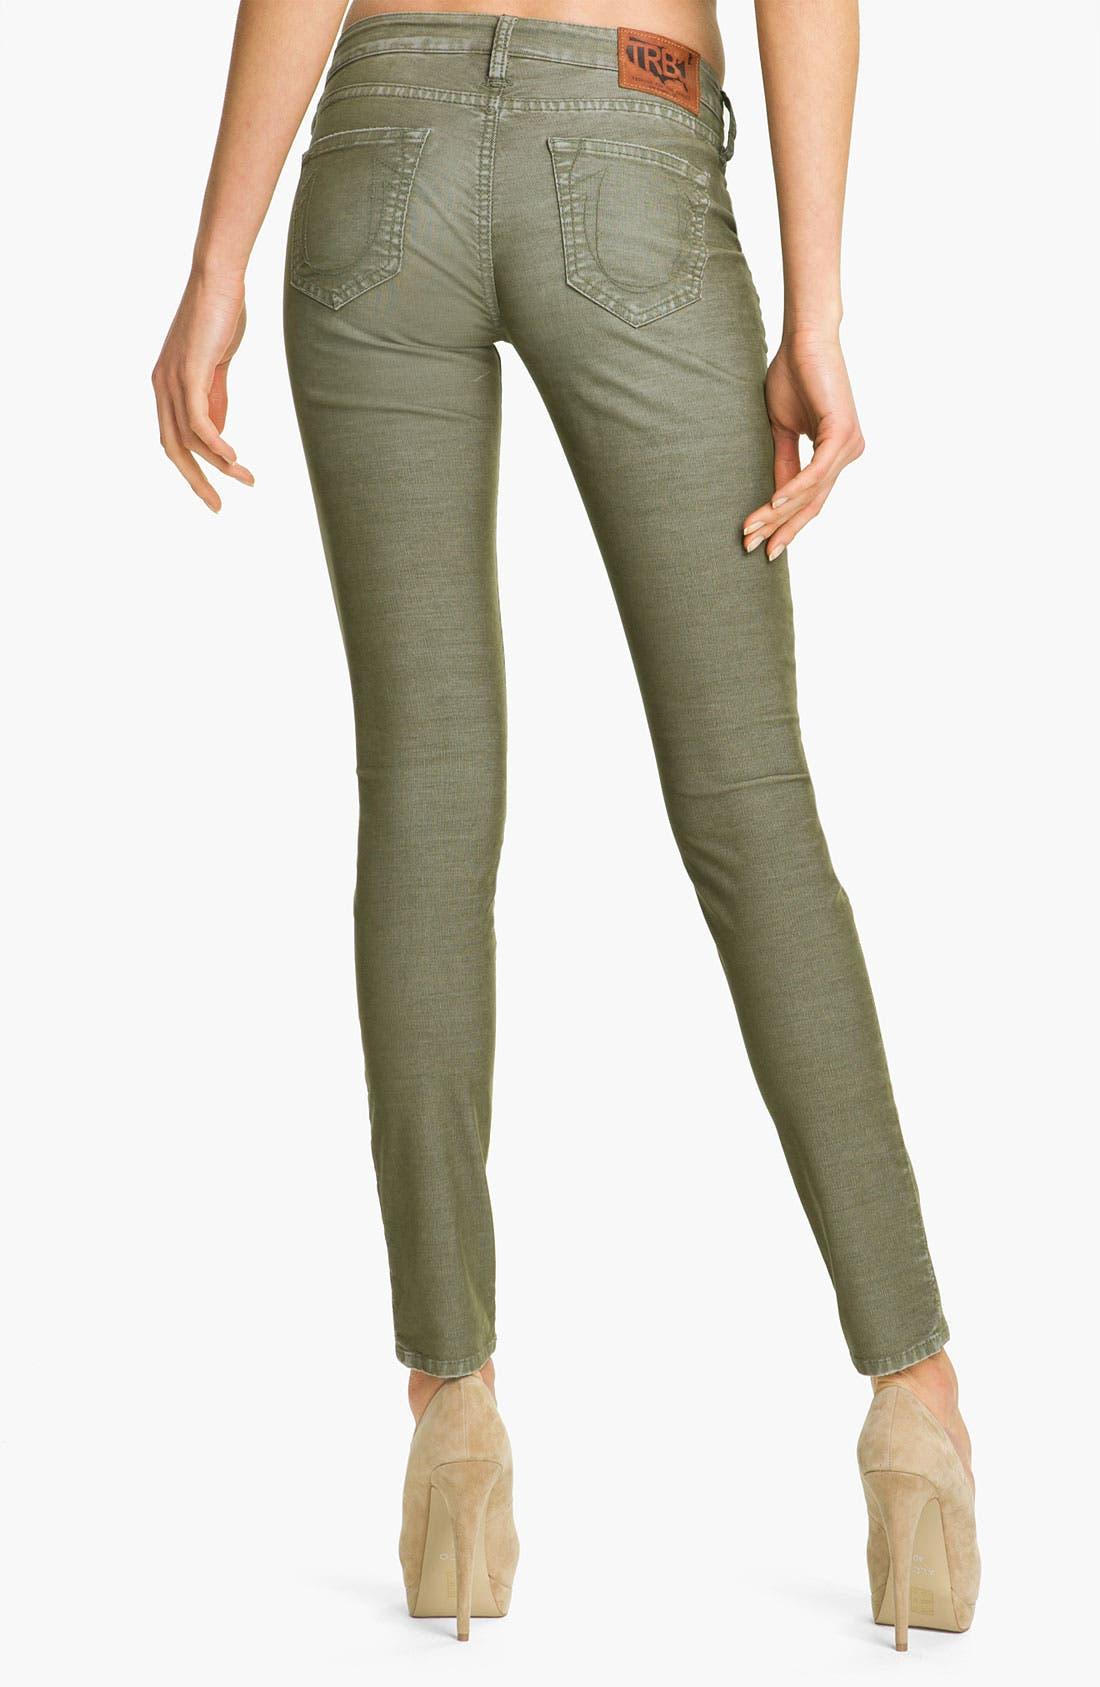 Alternate Image 1 Selected - True Religion Brand Jeans 'Shannon' Skinny Corduroy Pants